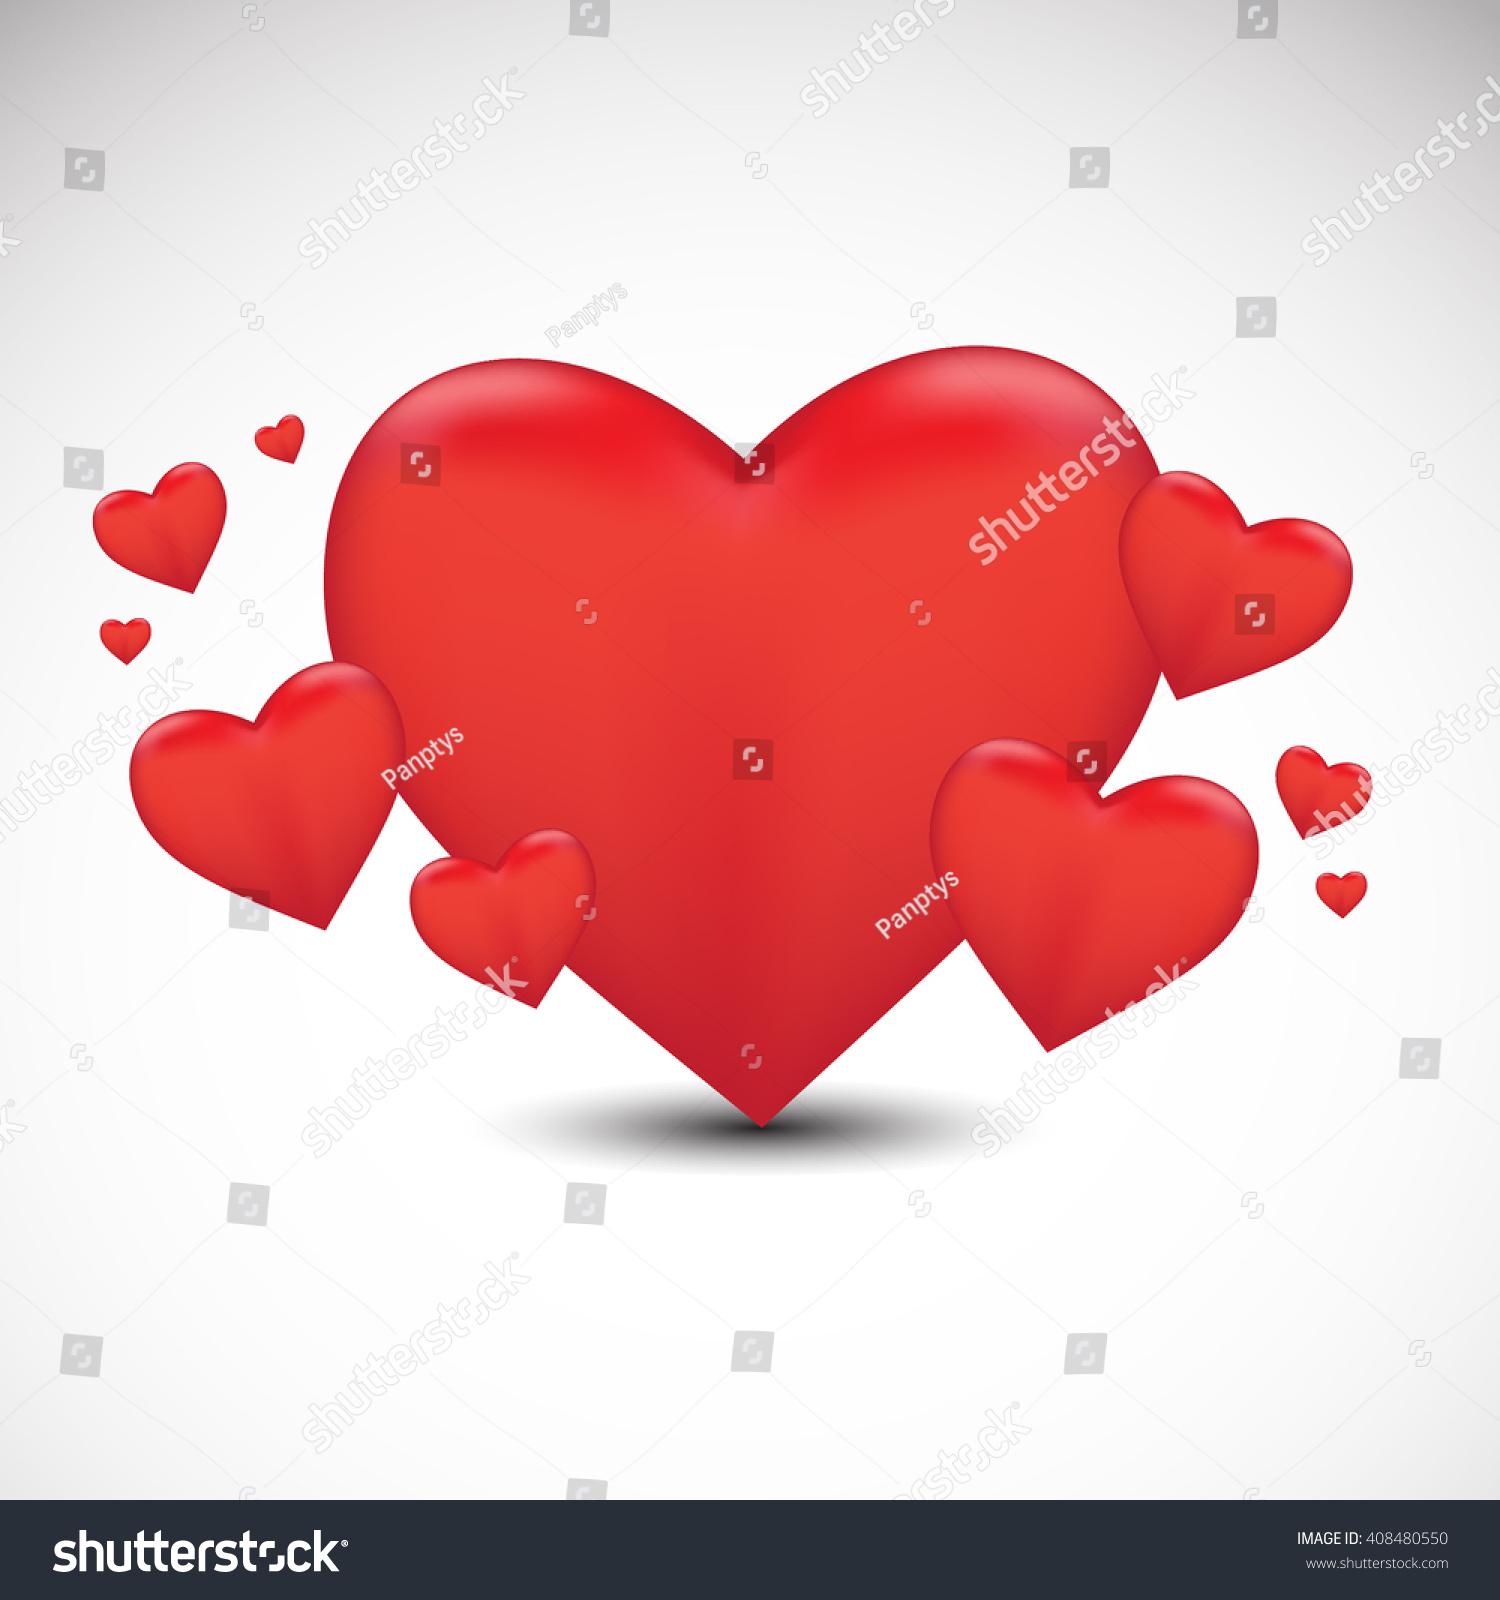 Love Feeling Emotion Illustration Valentines Day Stock Vector